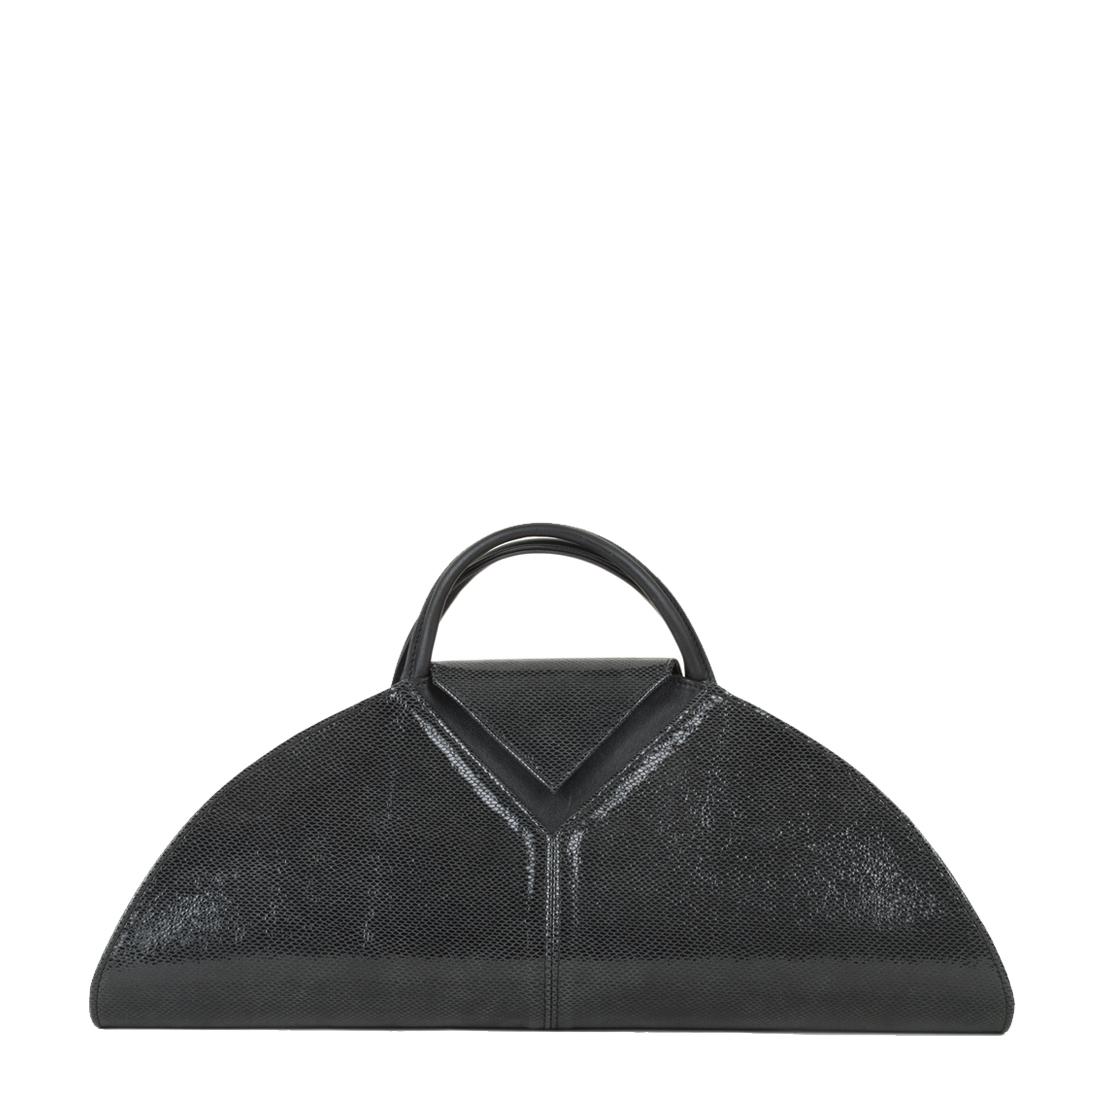 V Clutch Black Print Leather Handbag